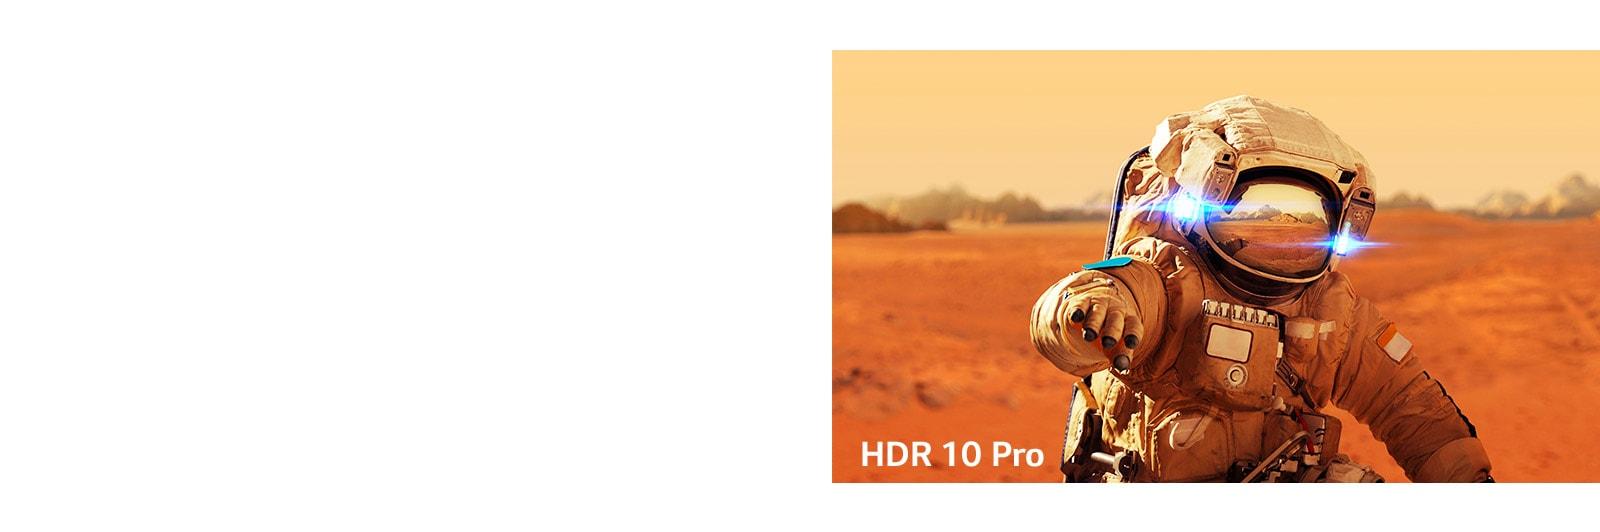 HDR 10 Pro1